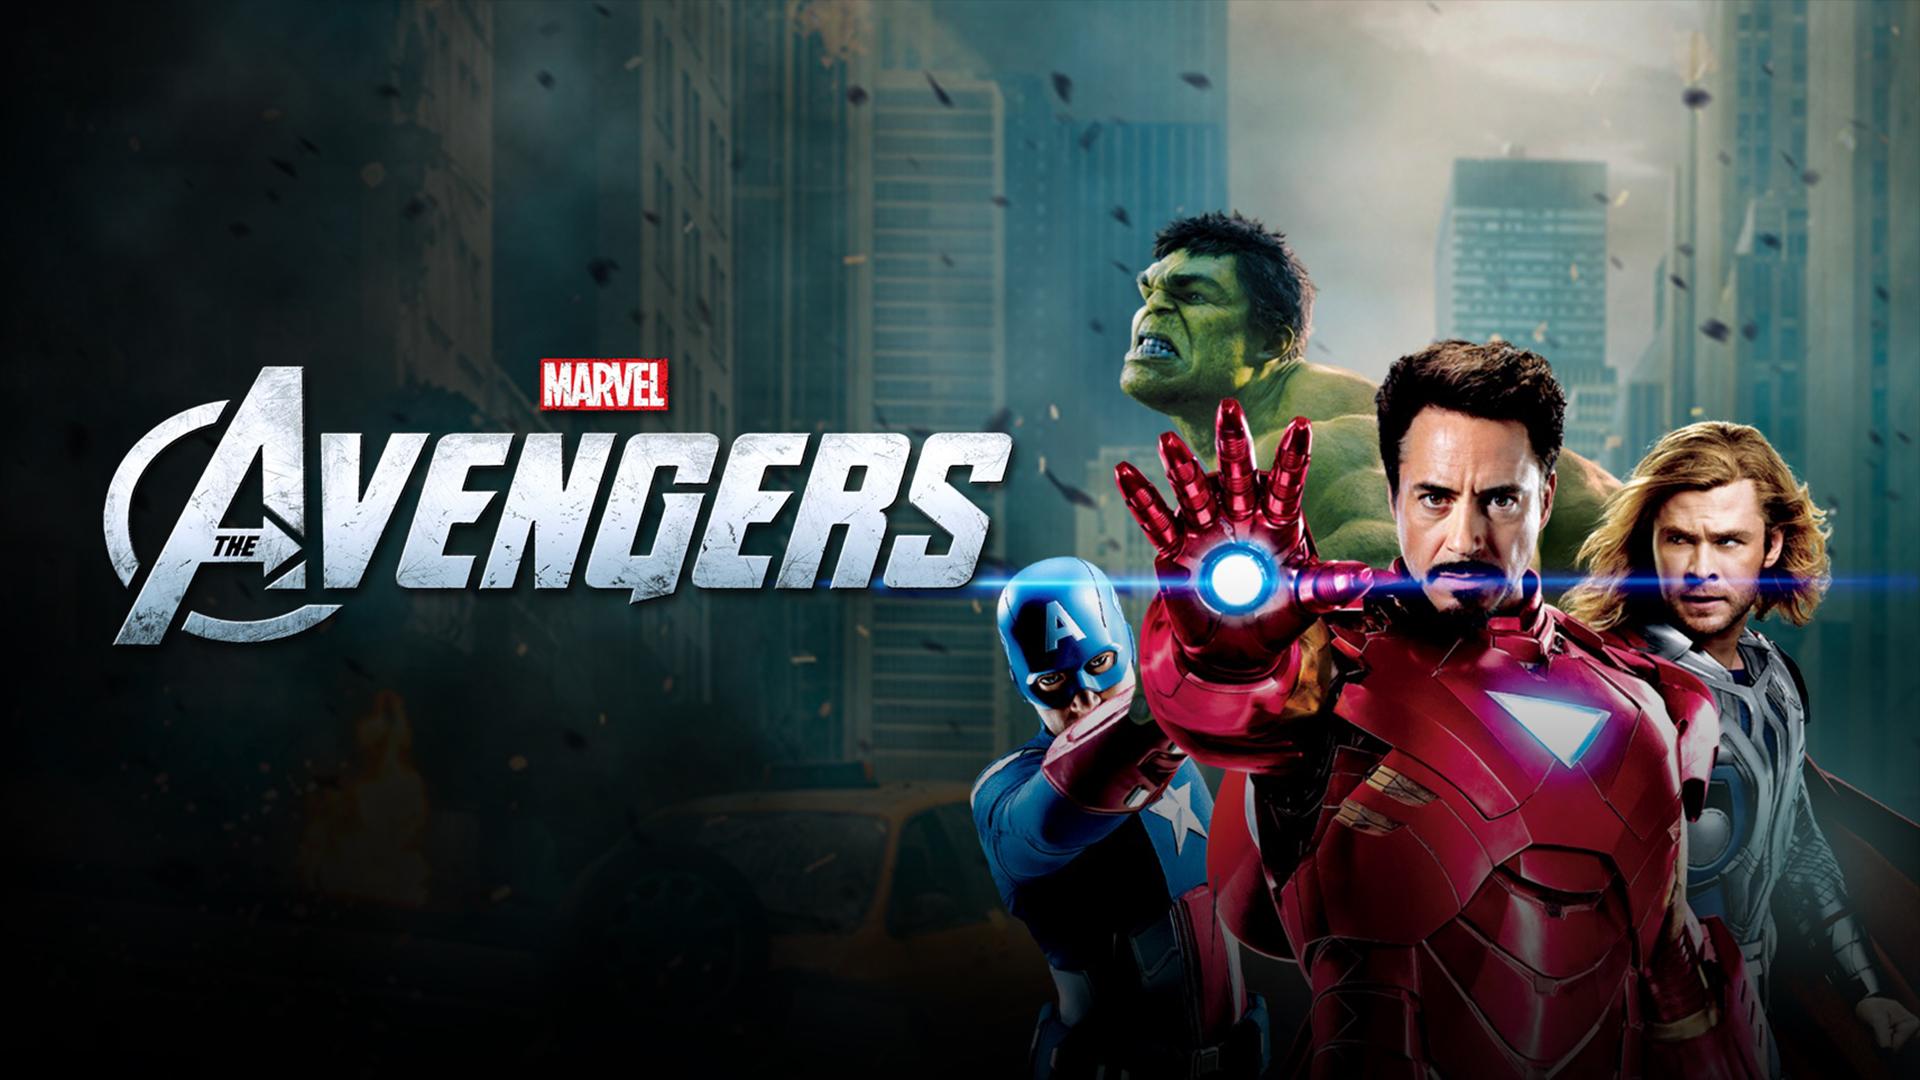 Avengers Iron Man Robert Downey Jr Thor Chris Hemsworth Hulk Captain America Tony Stark Steve Rogers 1920x1080